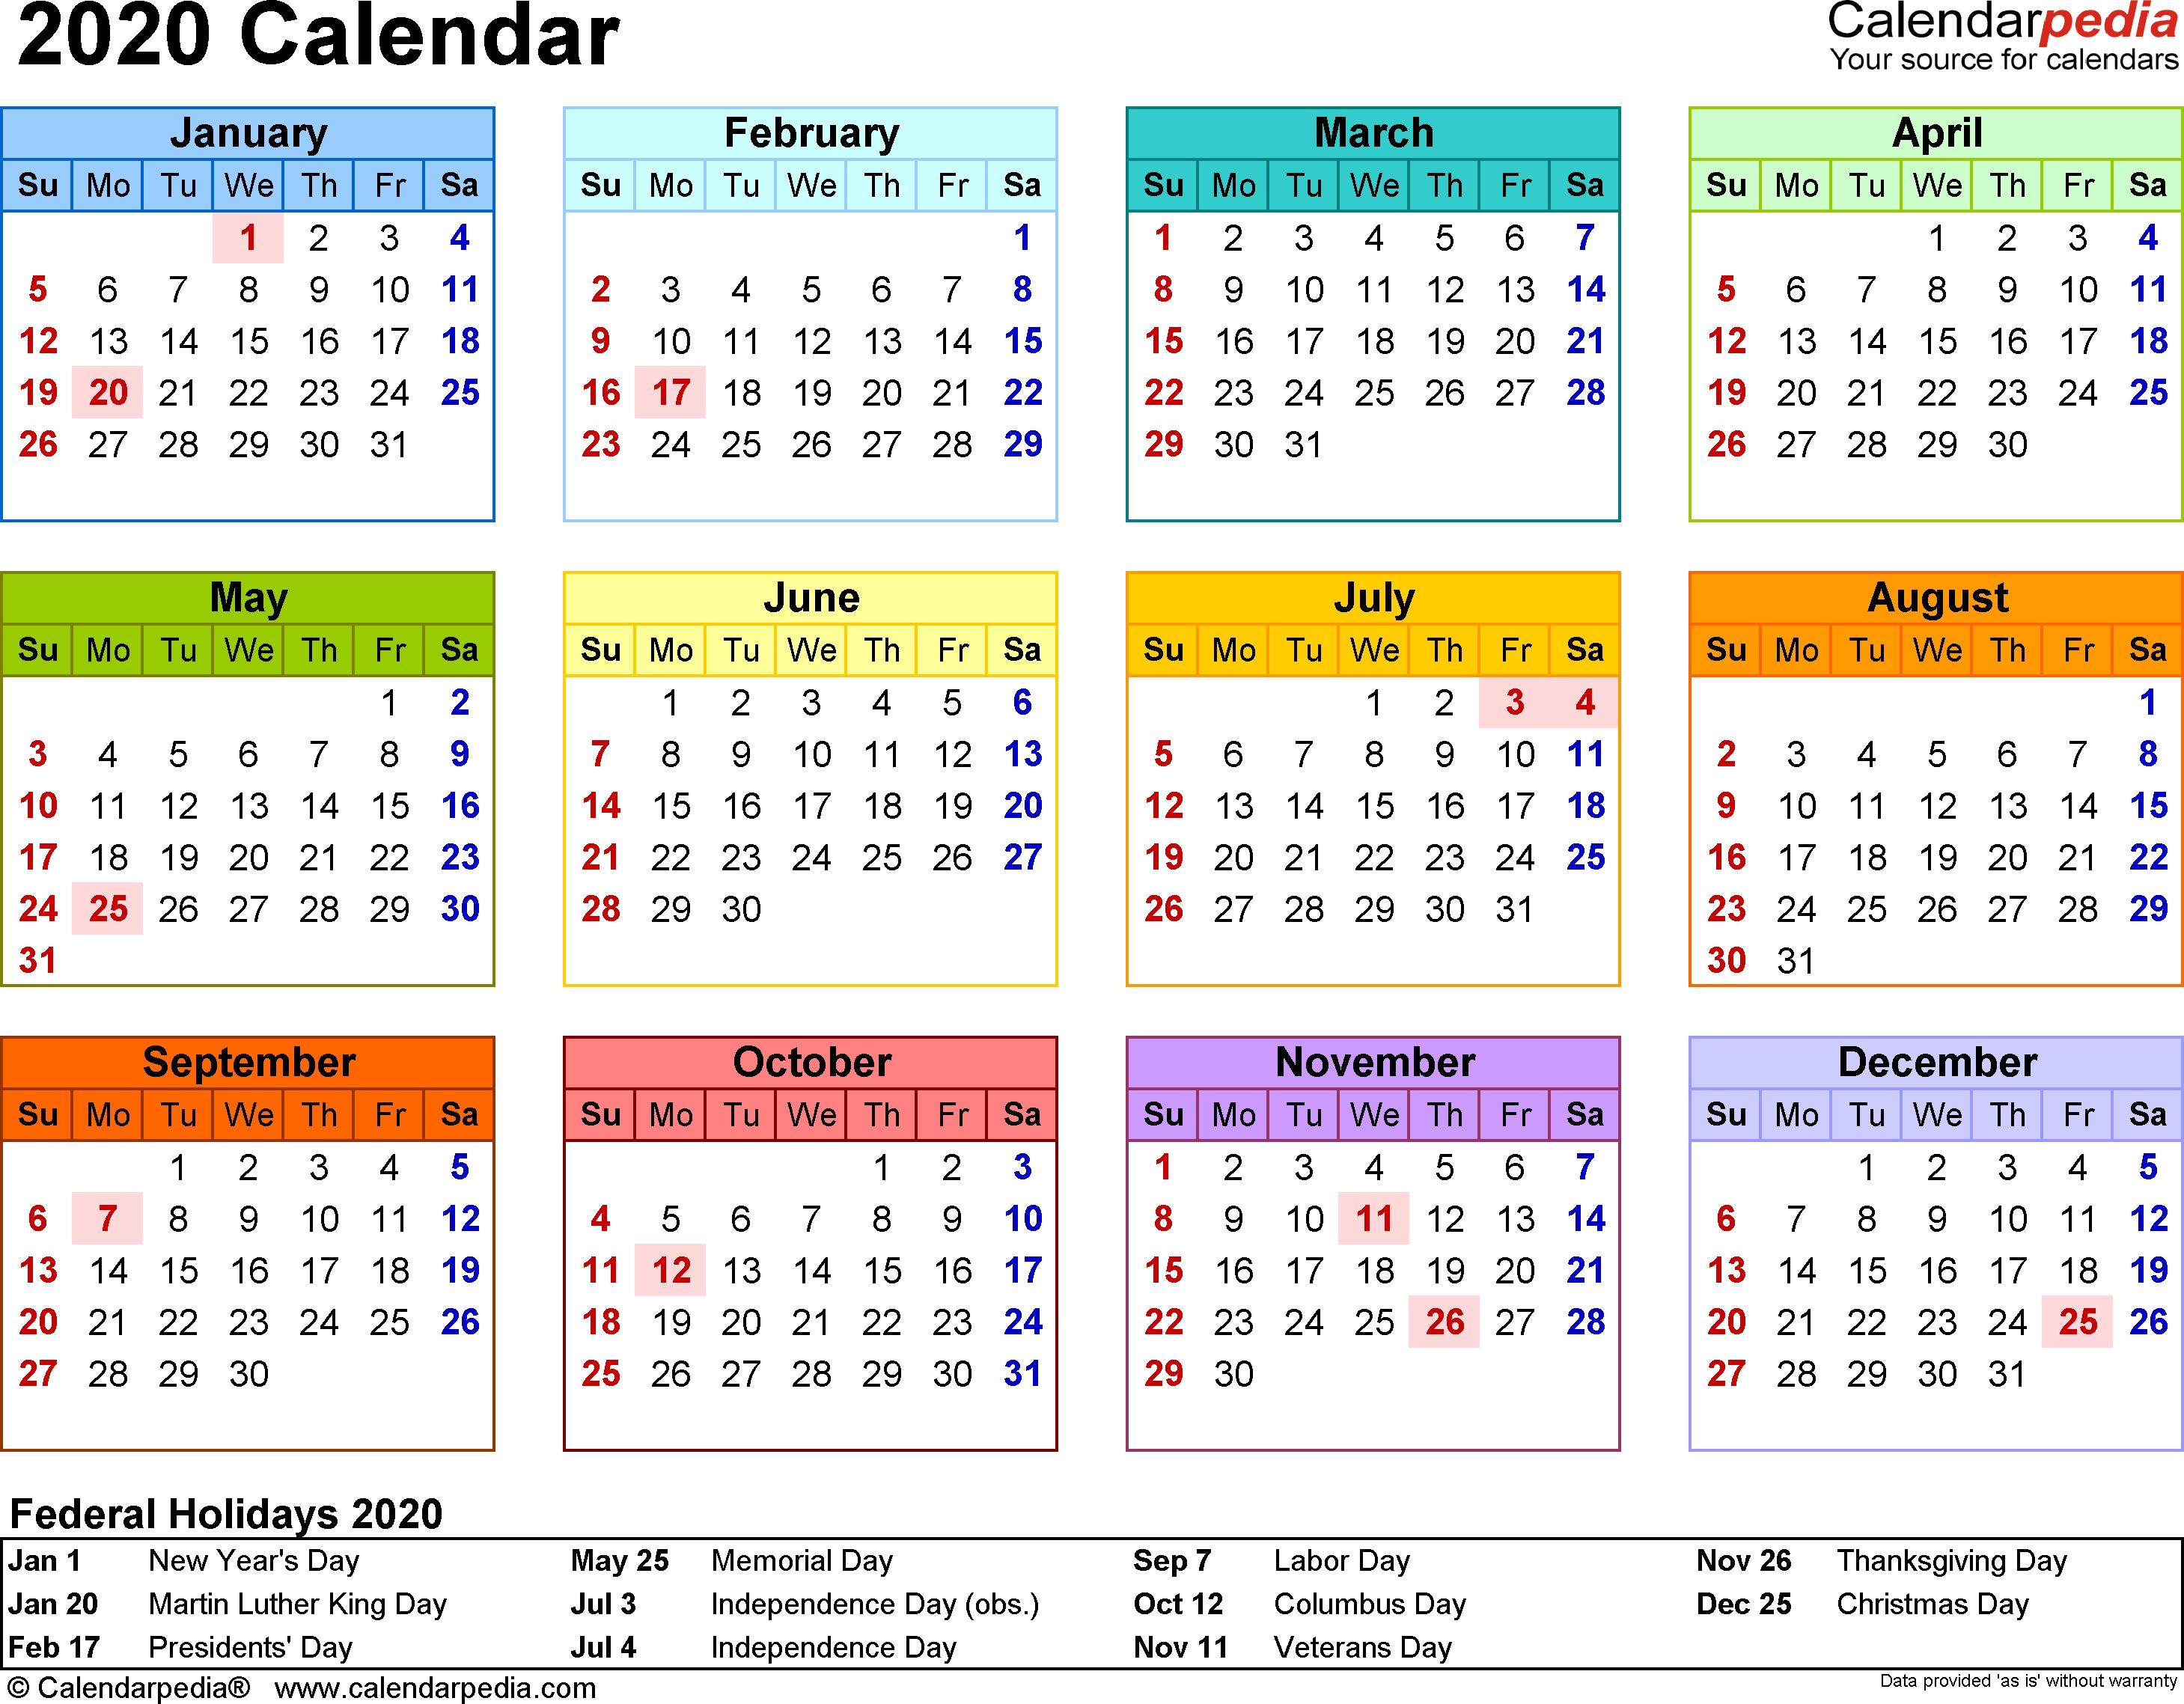 2020 Calendar - Free Printable Microsoft Word Templates Free 2020 Calendar At A Glance